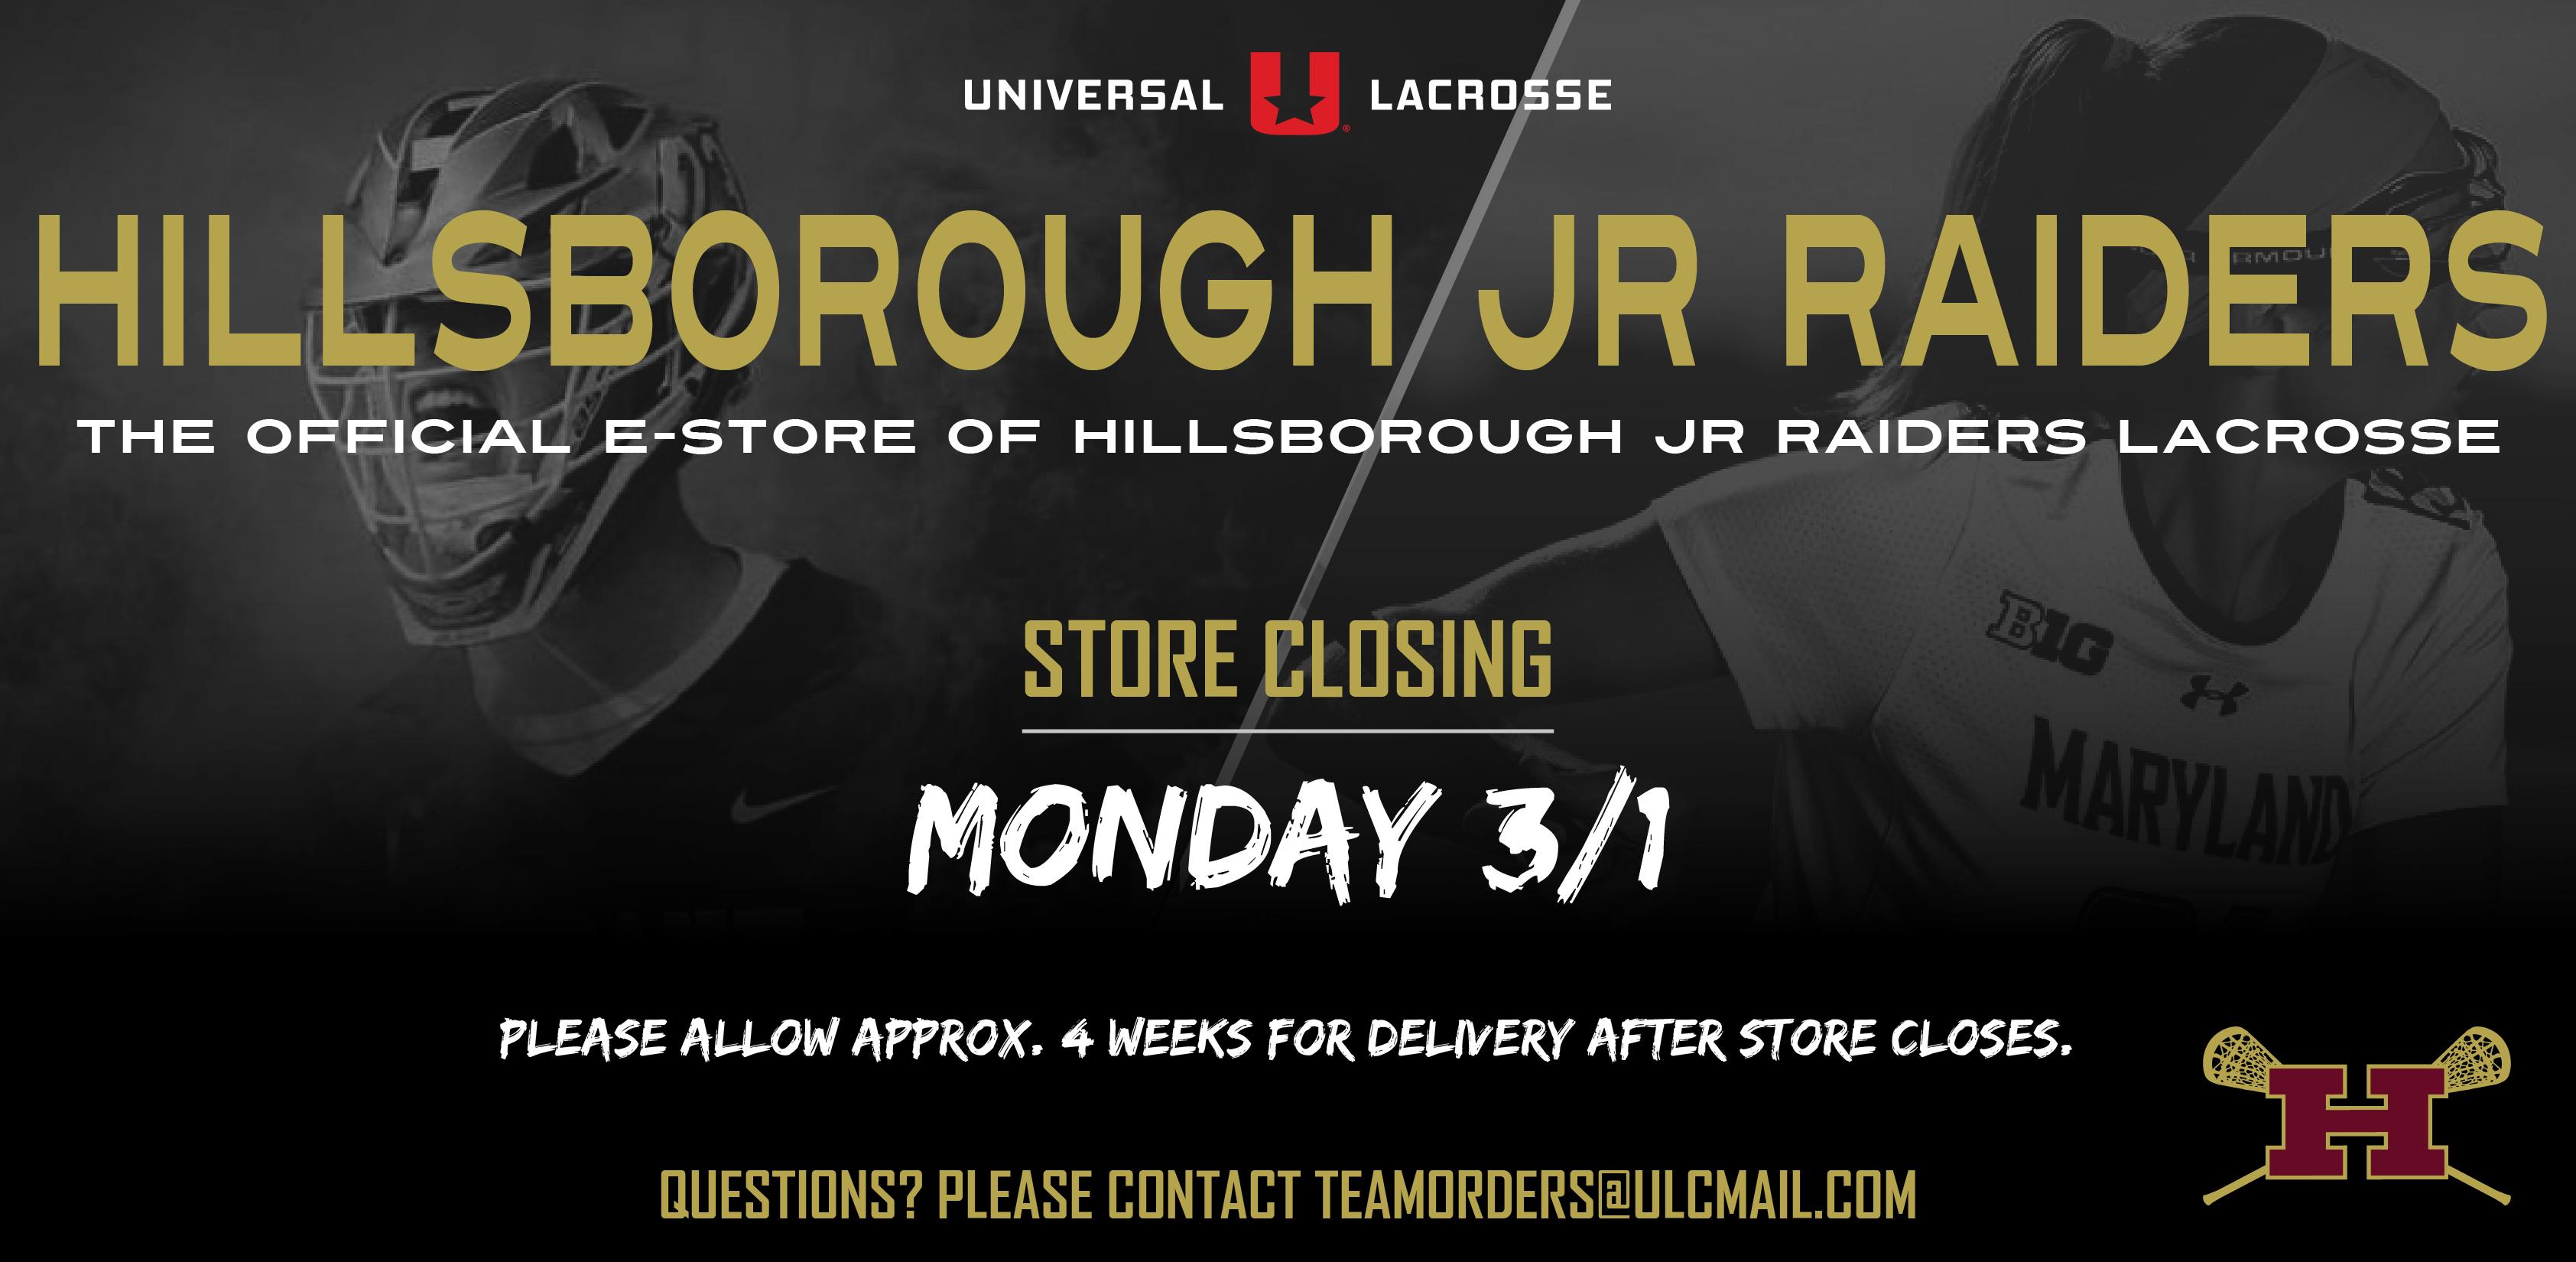 Hillsborough Jr Raiders Lacrosse